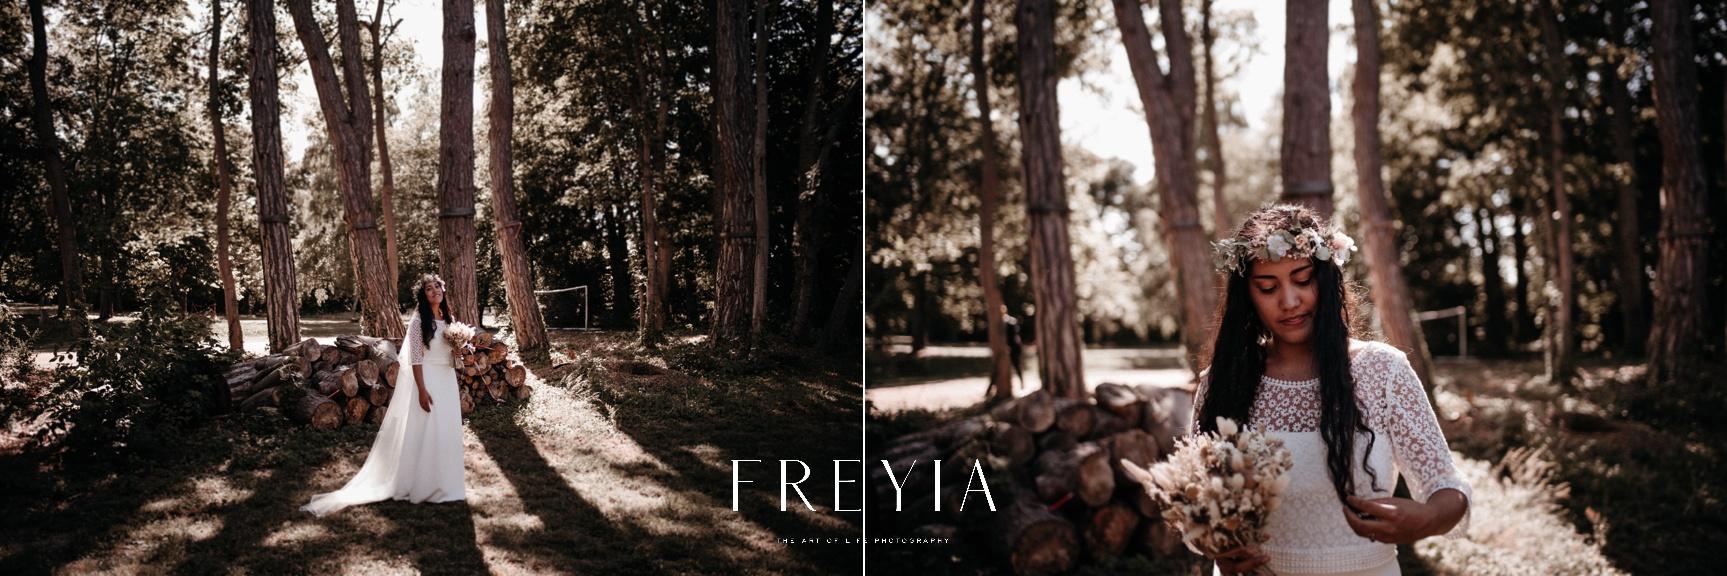 R + T |  mariage reportage alternatif moody intime minimaliste vintage naturel boho boheme |  PHOTOGRAPHE mariage PARIS france destination  | FREYIA photography_-212.jpg